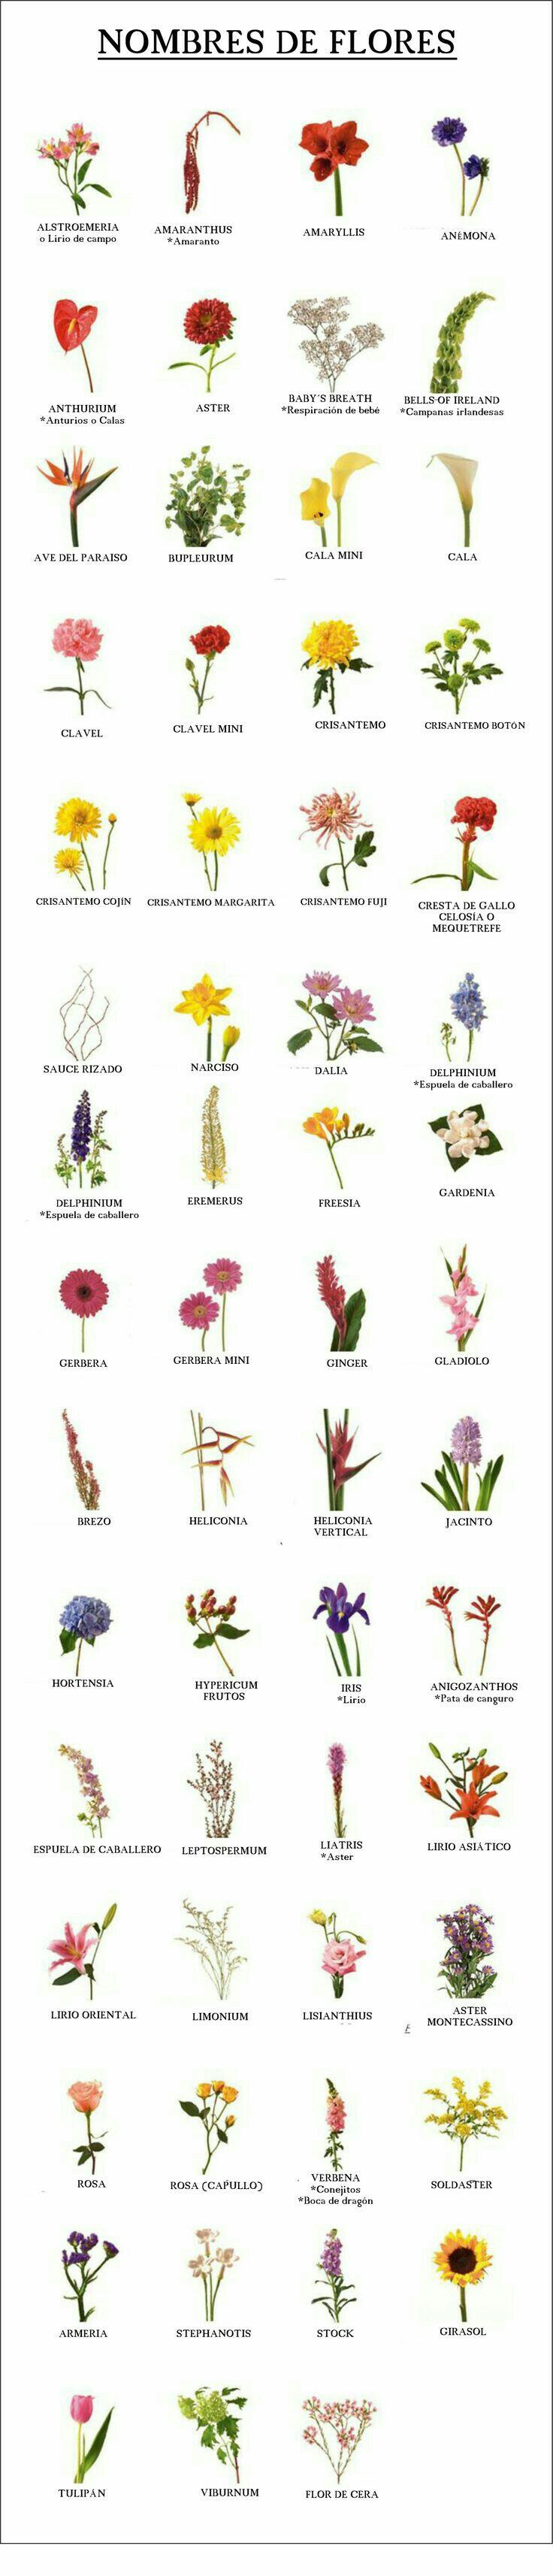 Tipos De Flores Nombres De Flores Arreglos De Flores Tipos De Flores